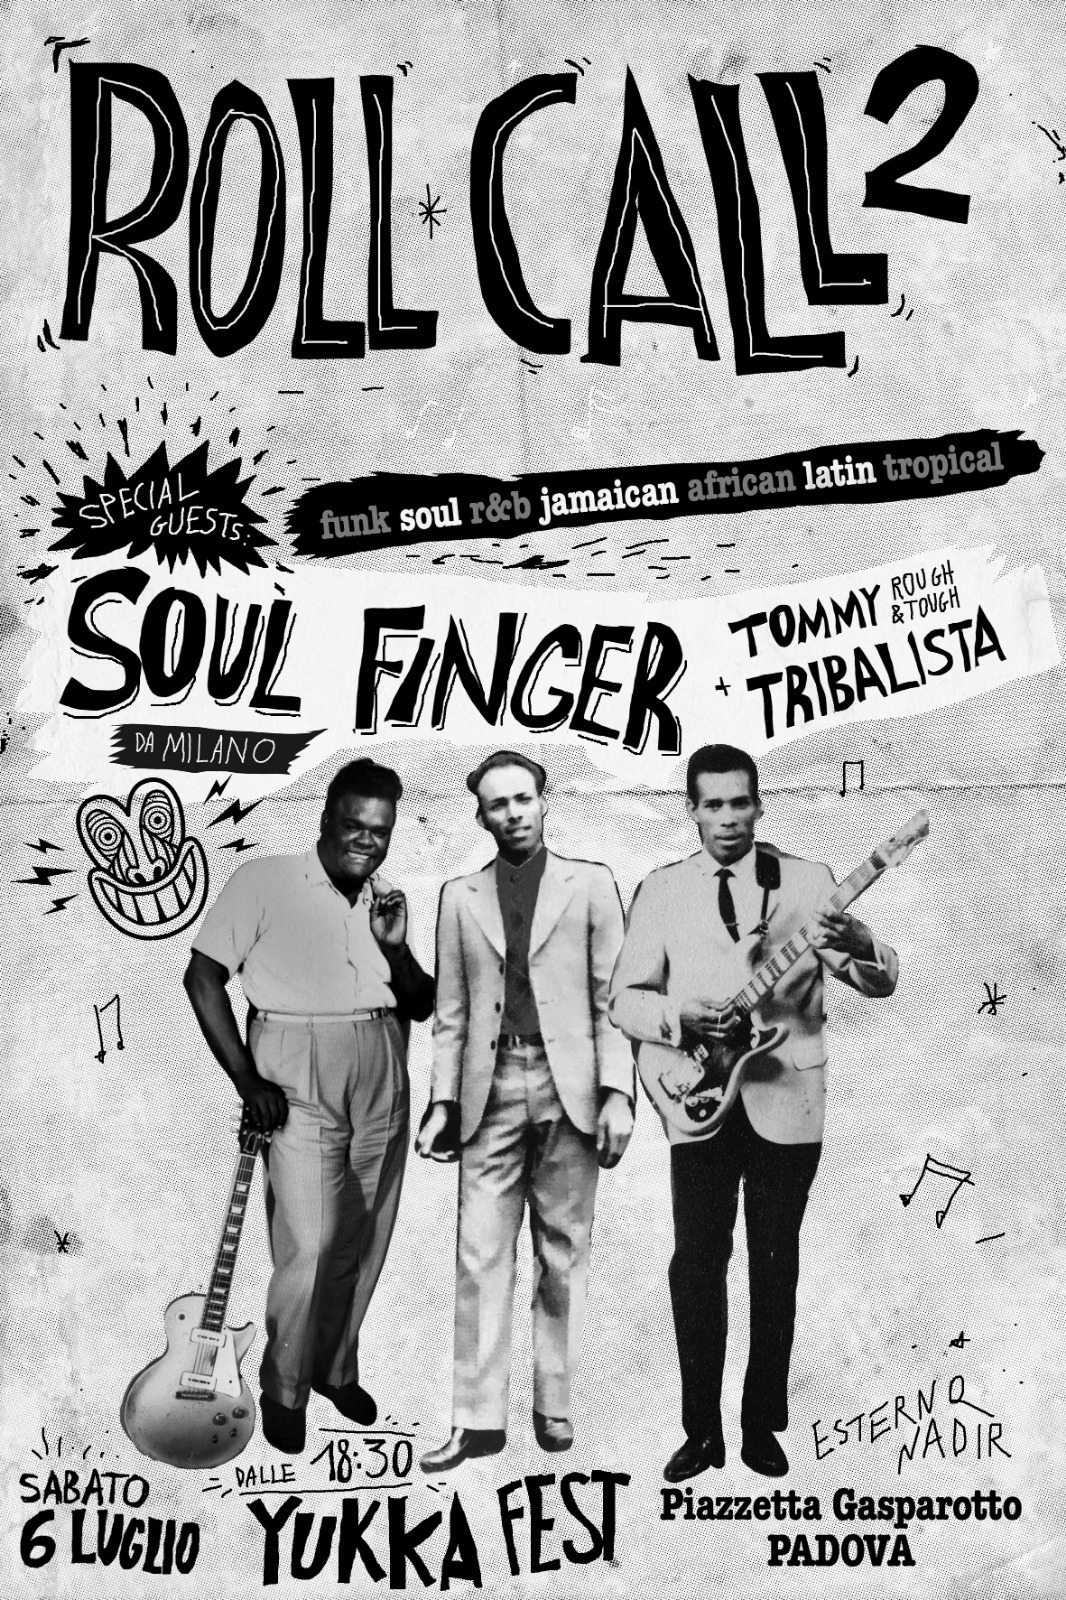 sabato 6 luglio 2019: Roll Call 2 @ Yukka Fest, Padova